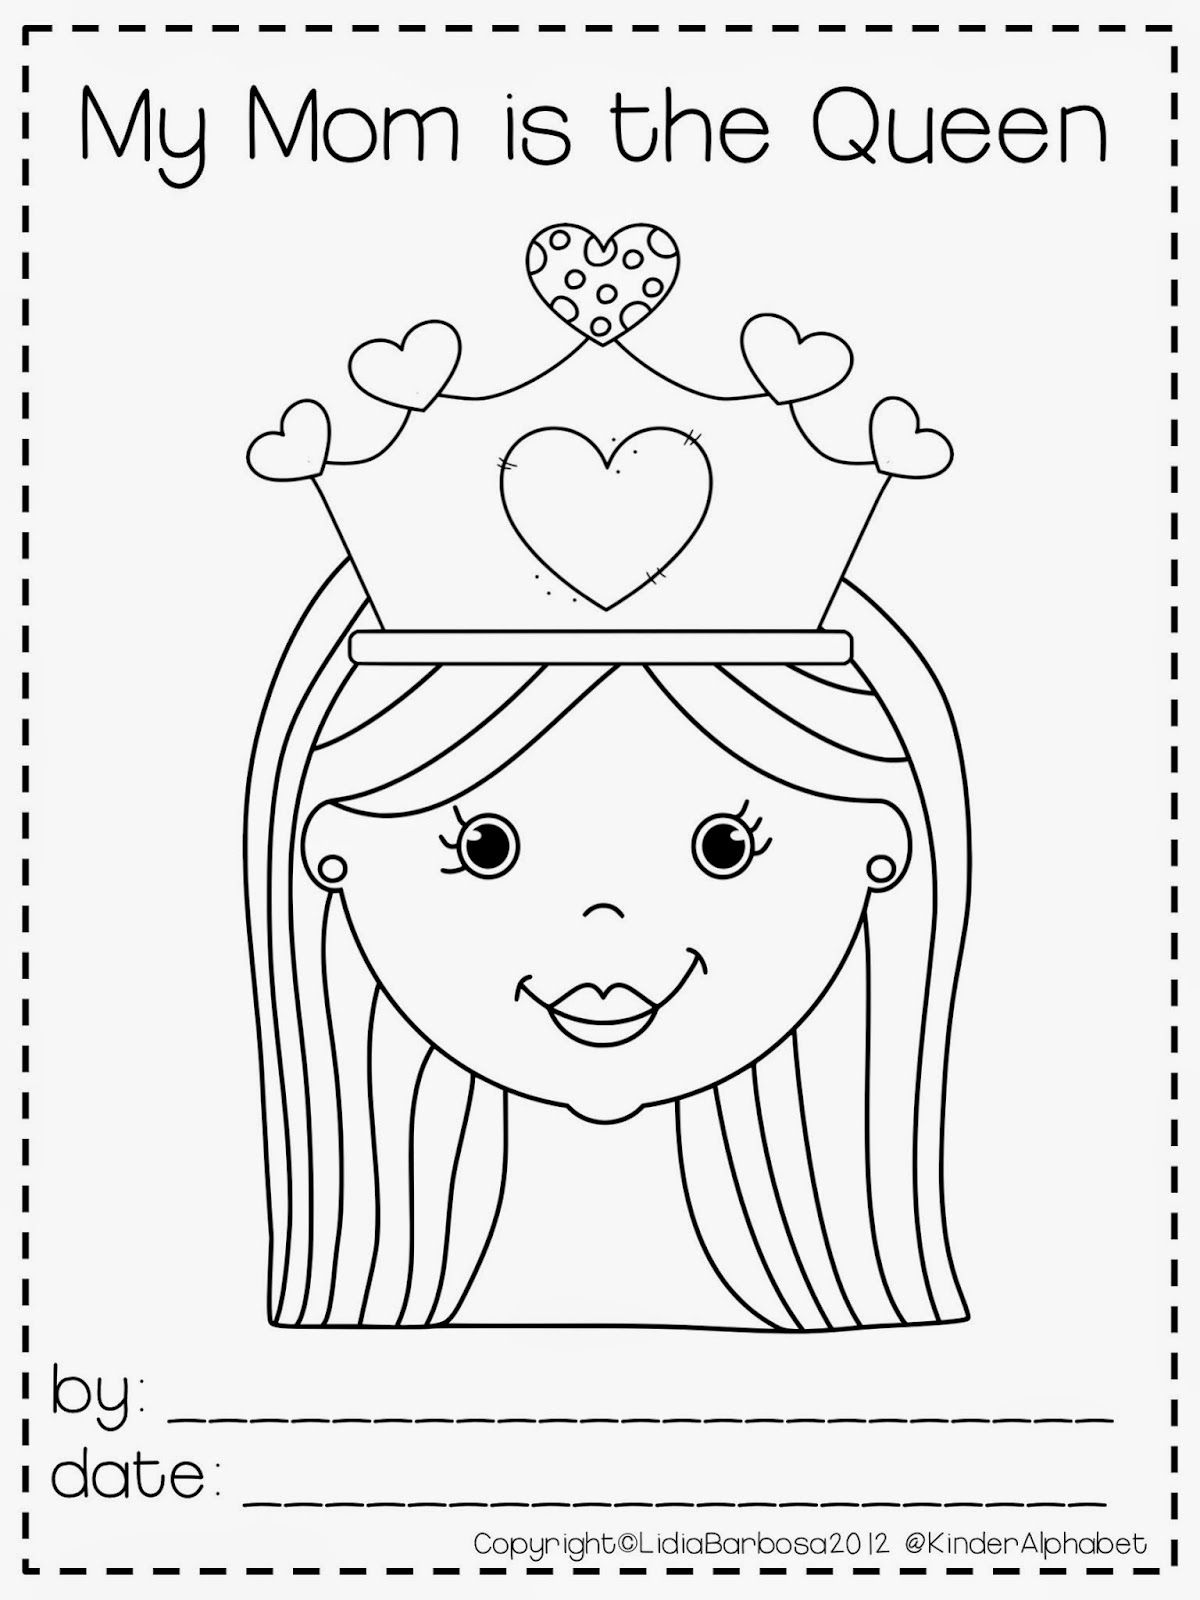 Kinder Alphabet Mother S Day Craftivity